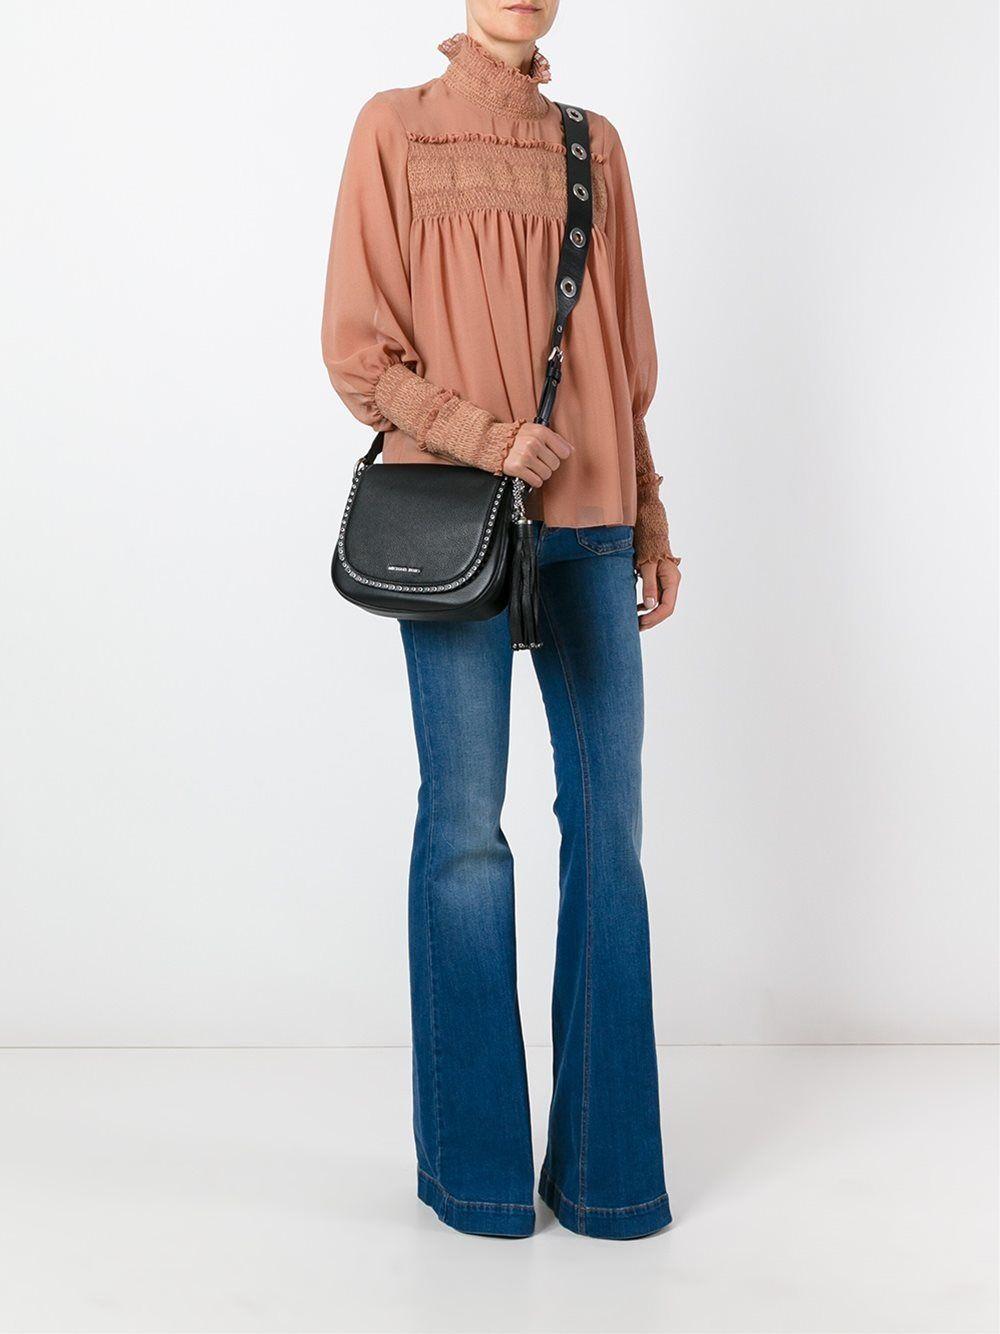 da714d553d7274 Michael Michael Kors 'Brooklyn' saddle bag | Michael Kors | Saddle ...